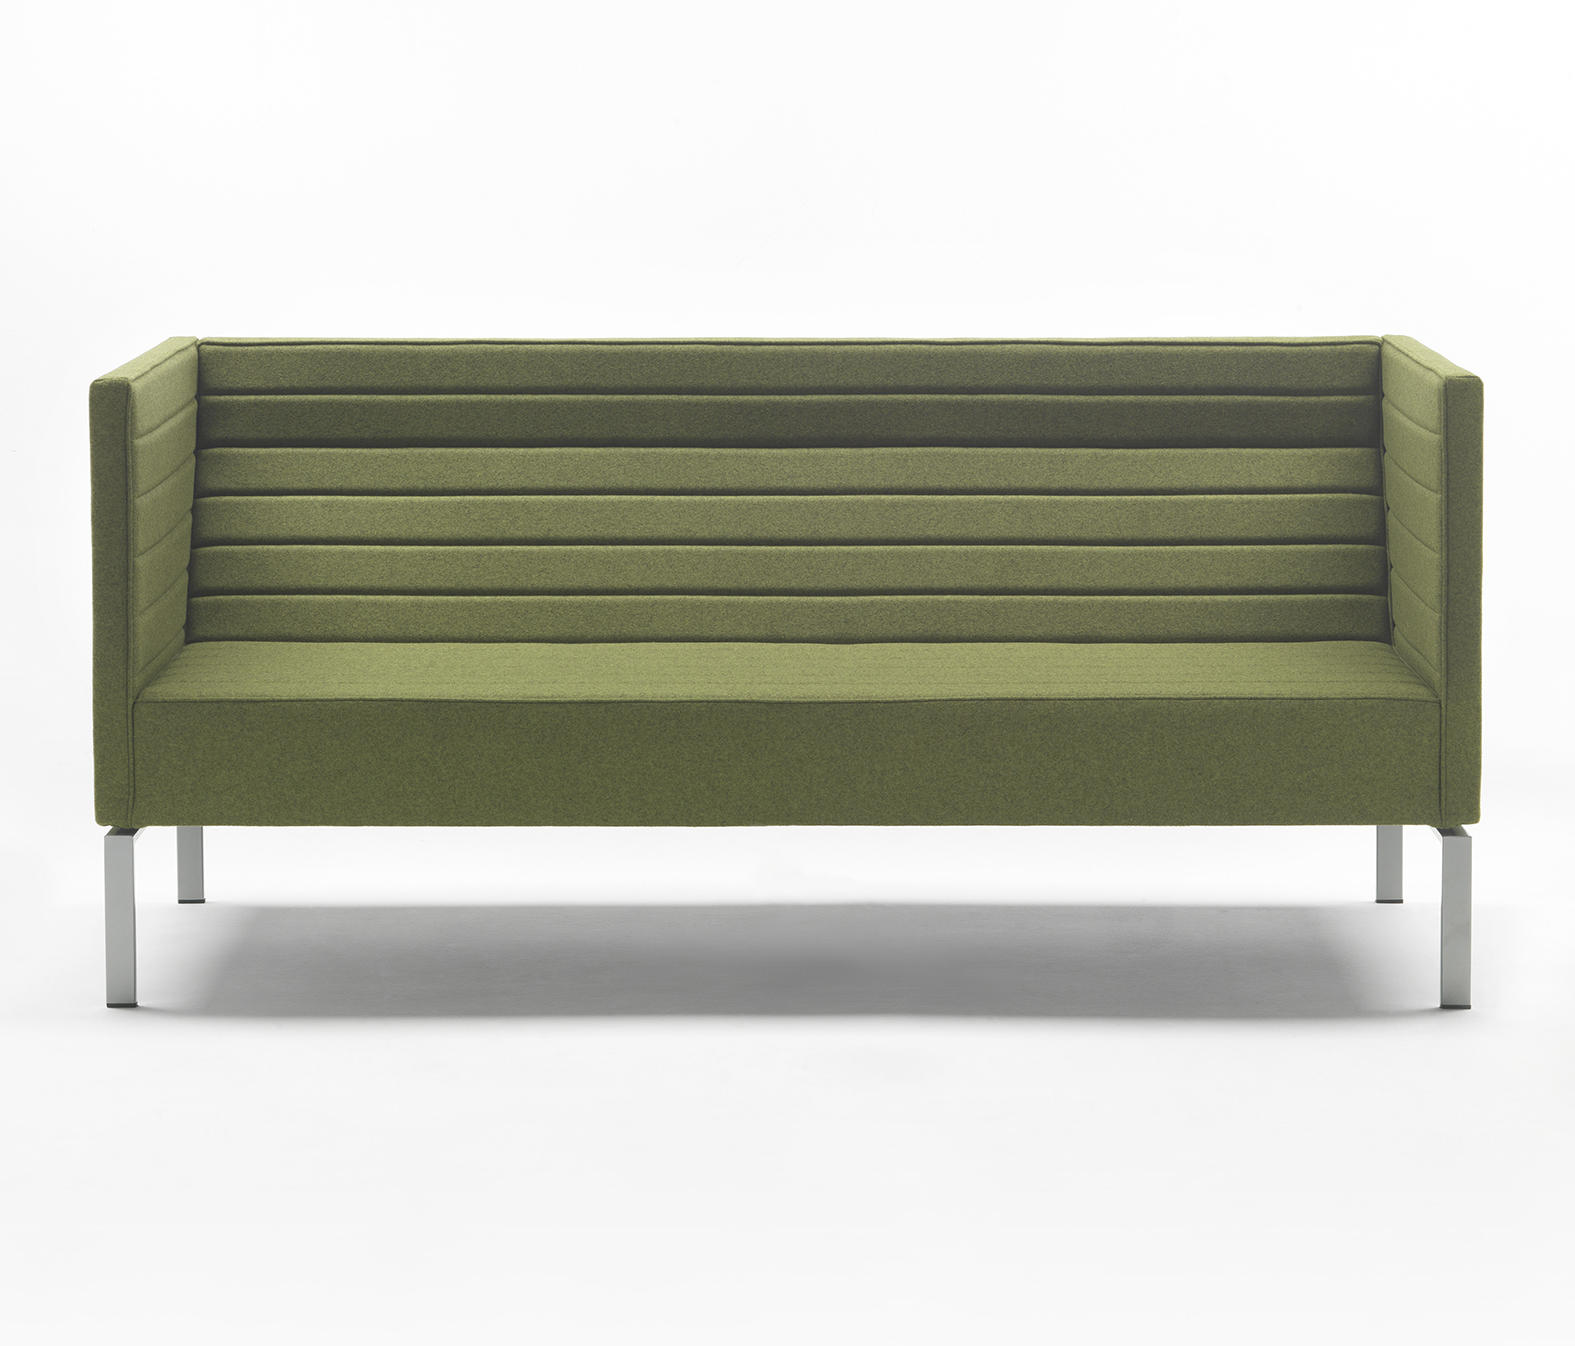 stripes canap canap s d 39 attente de giulio marelli architonic. Black Bedroom Furniture Sets. Home Design Ideas